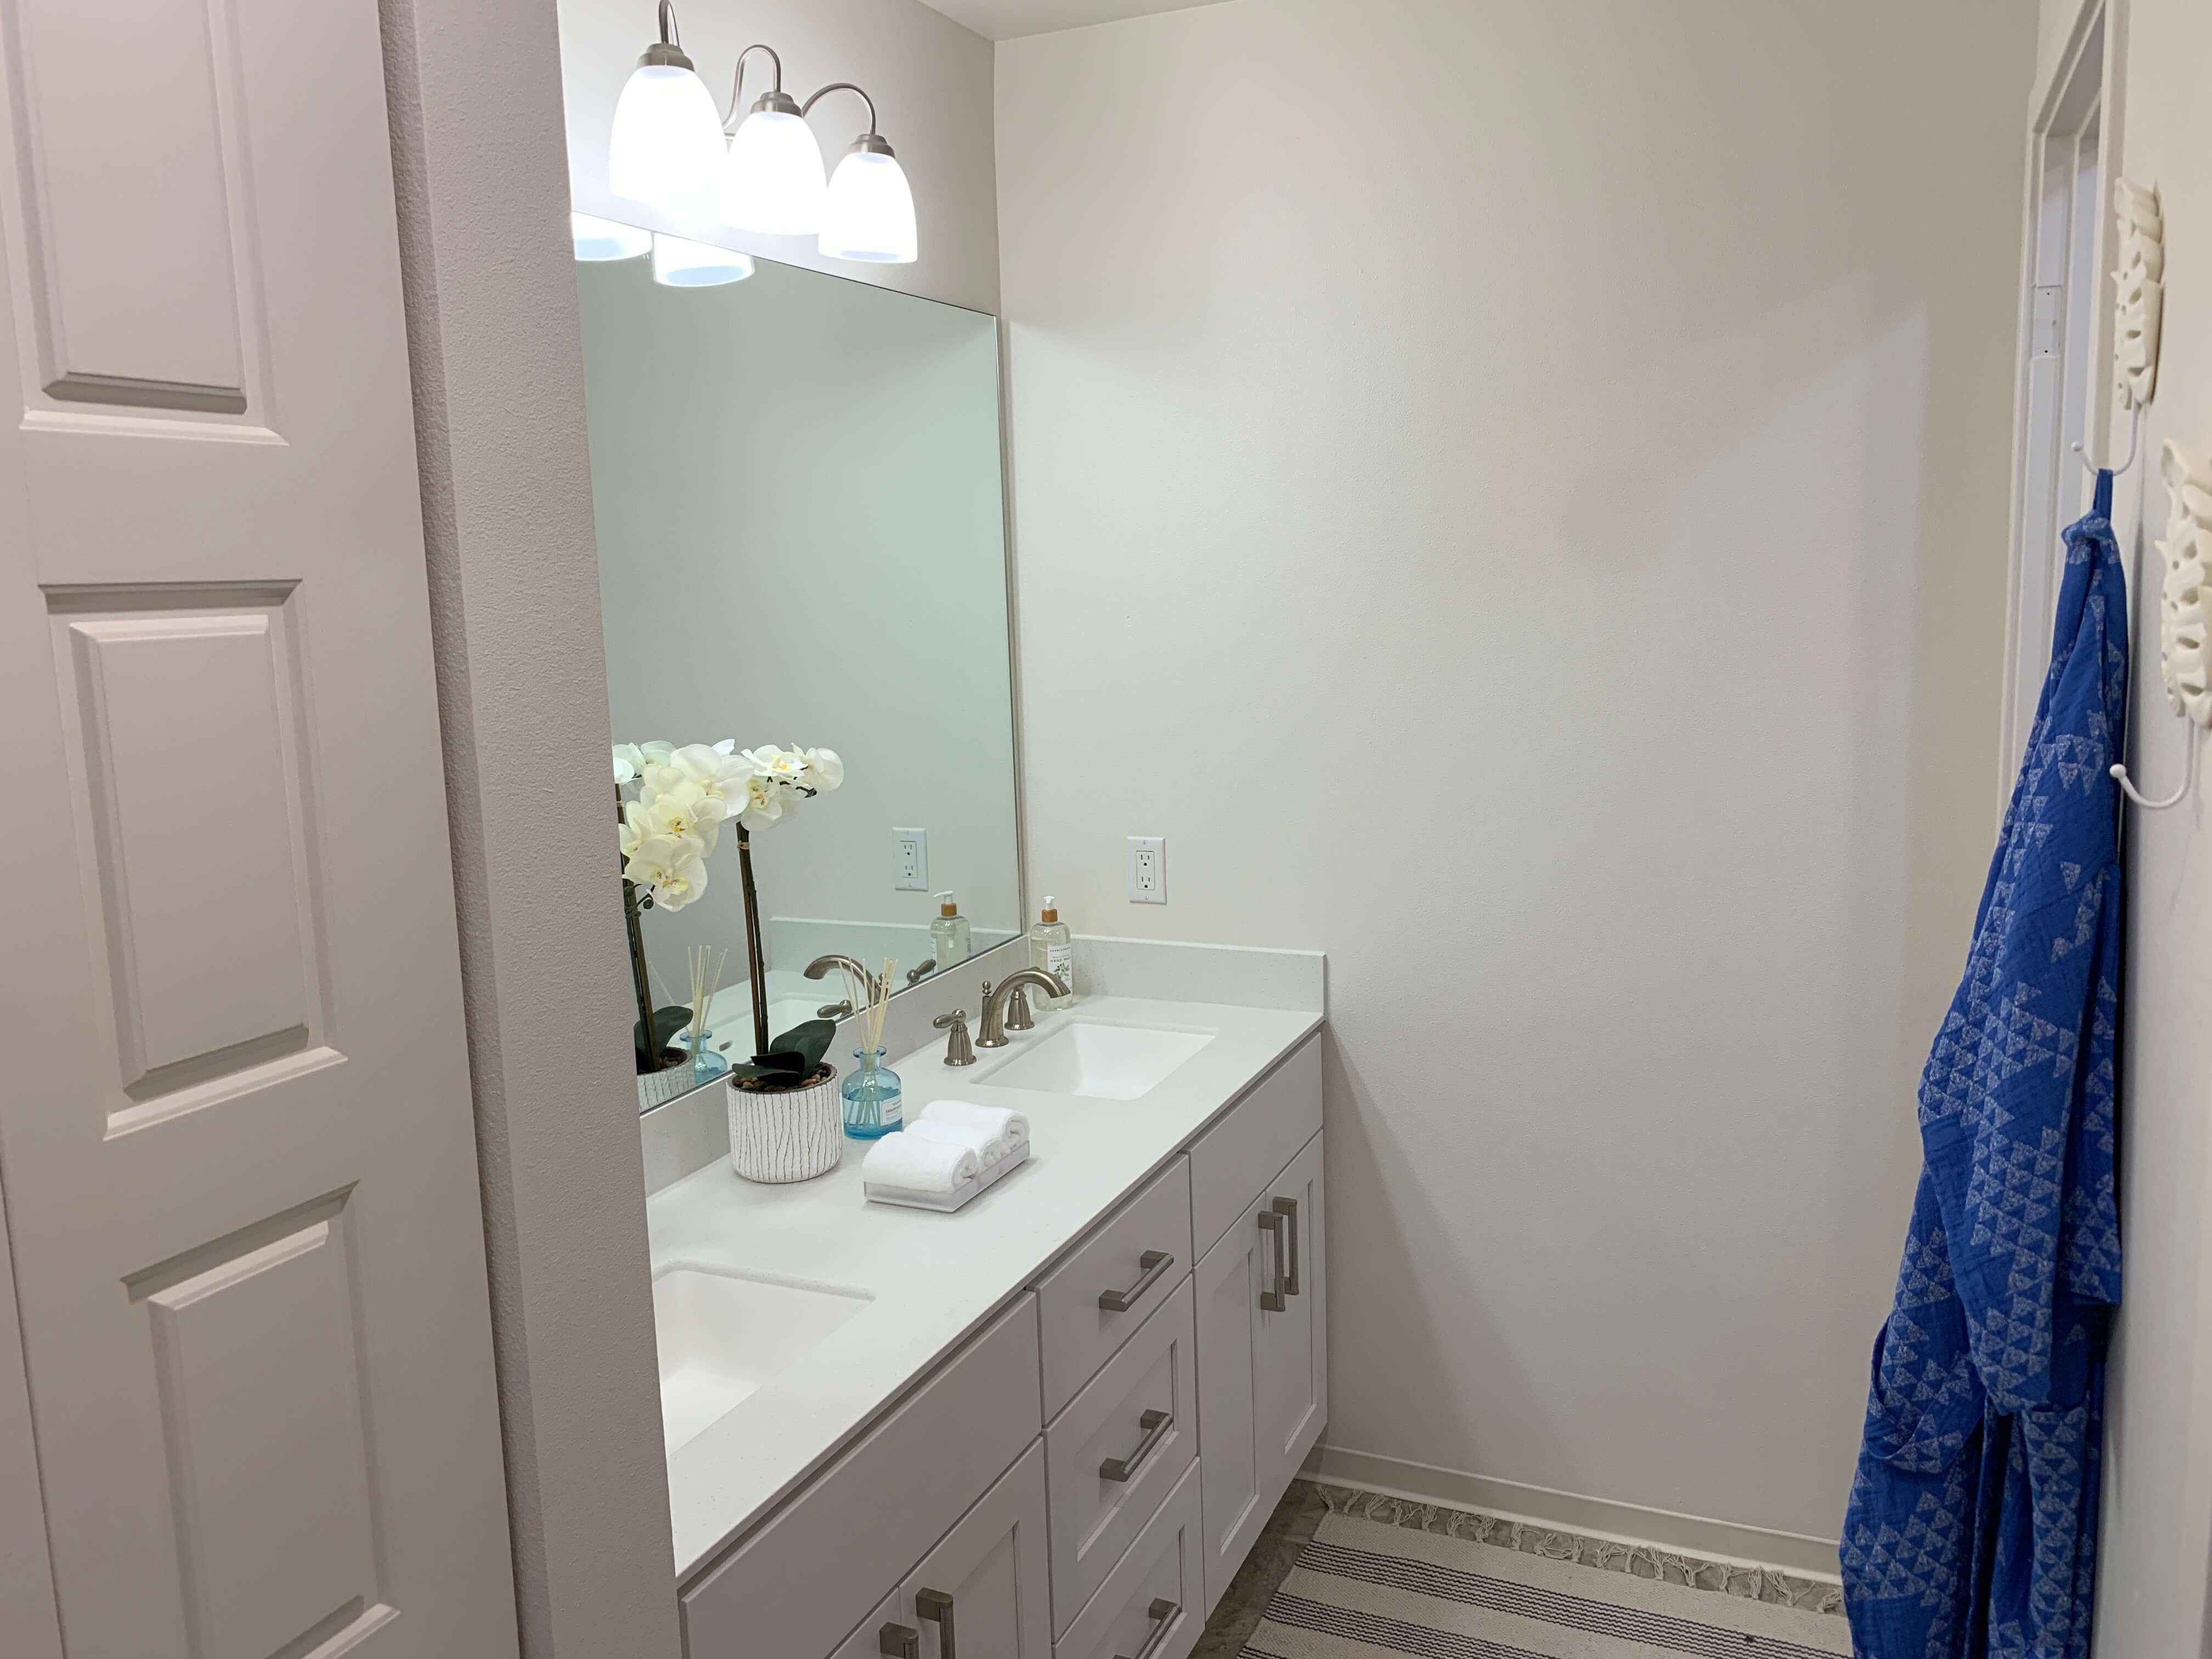 kohina at ho'opili master bathroom